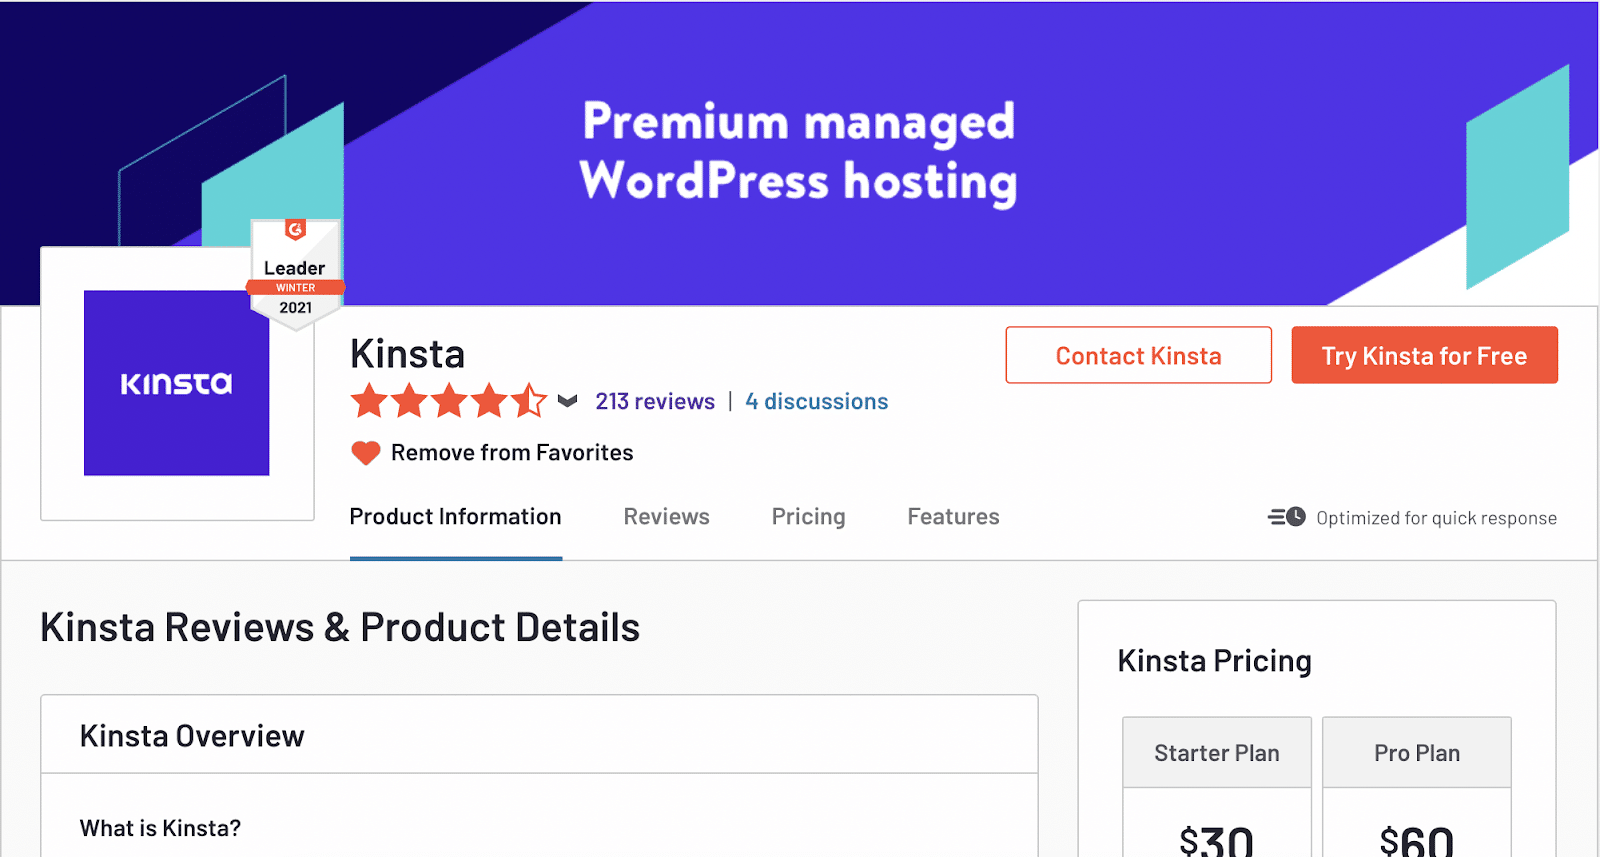 Kinsta's G2 profile